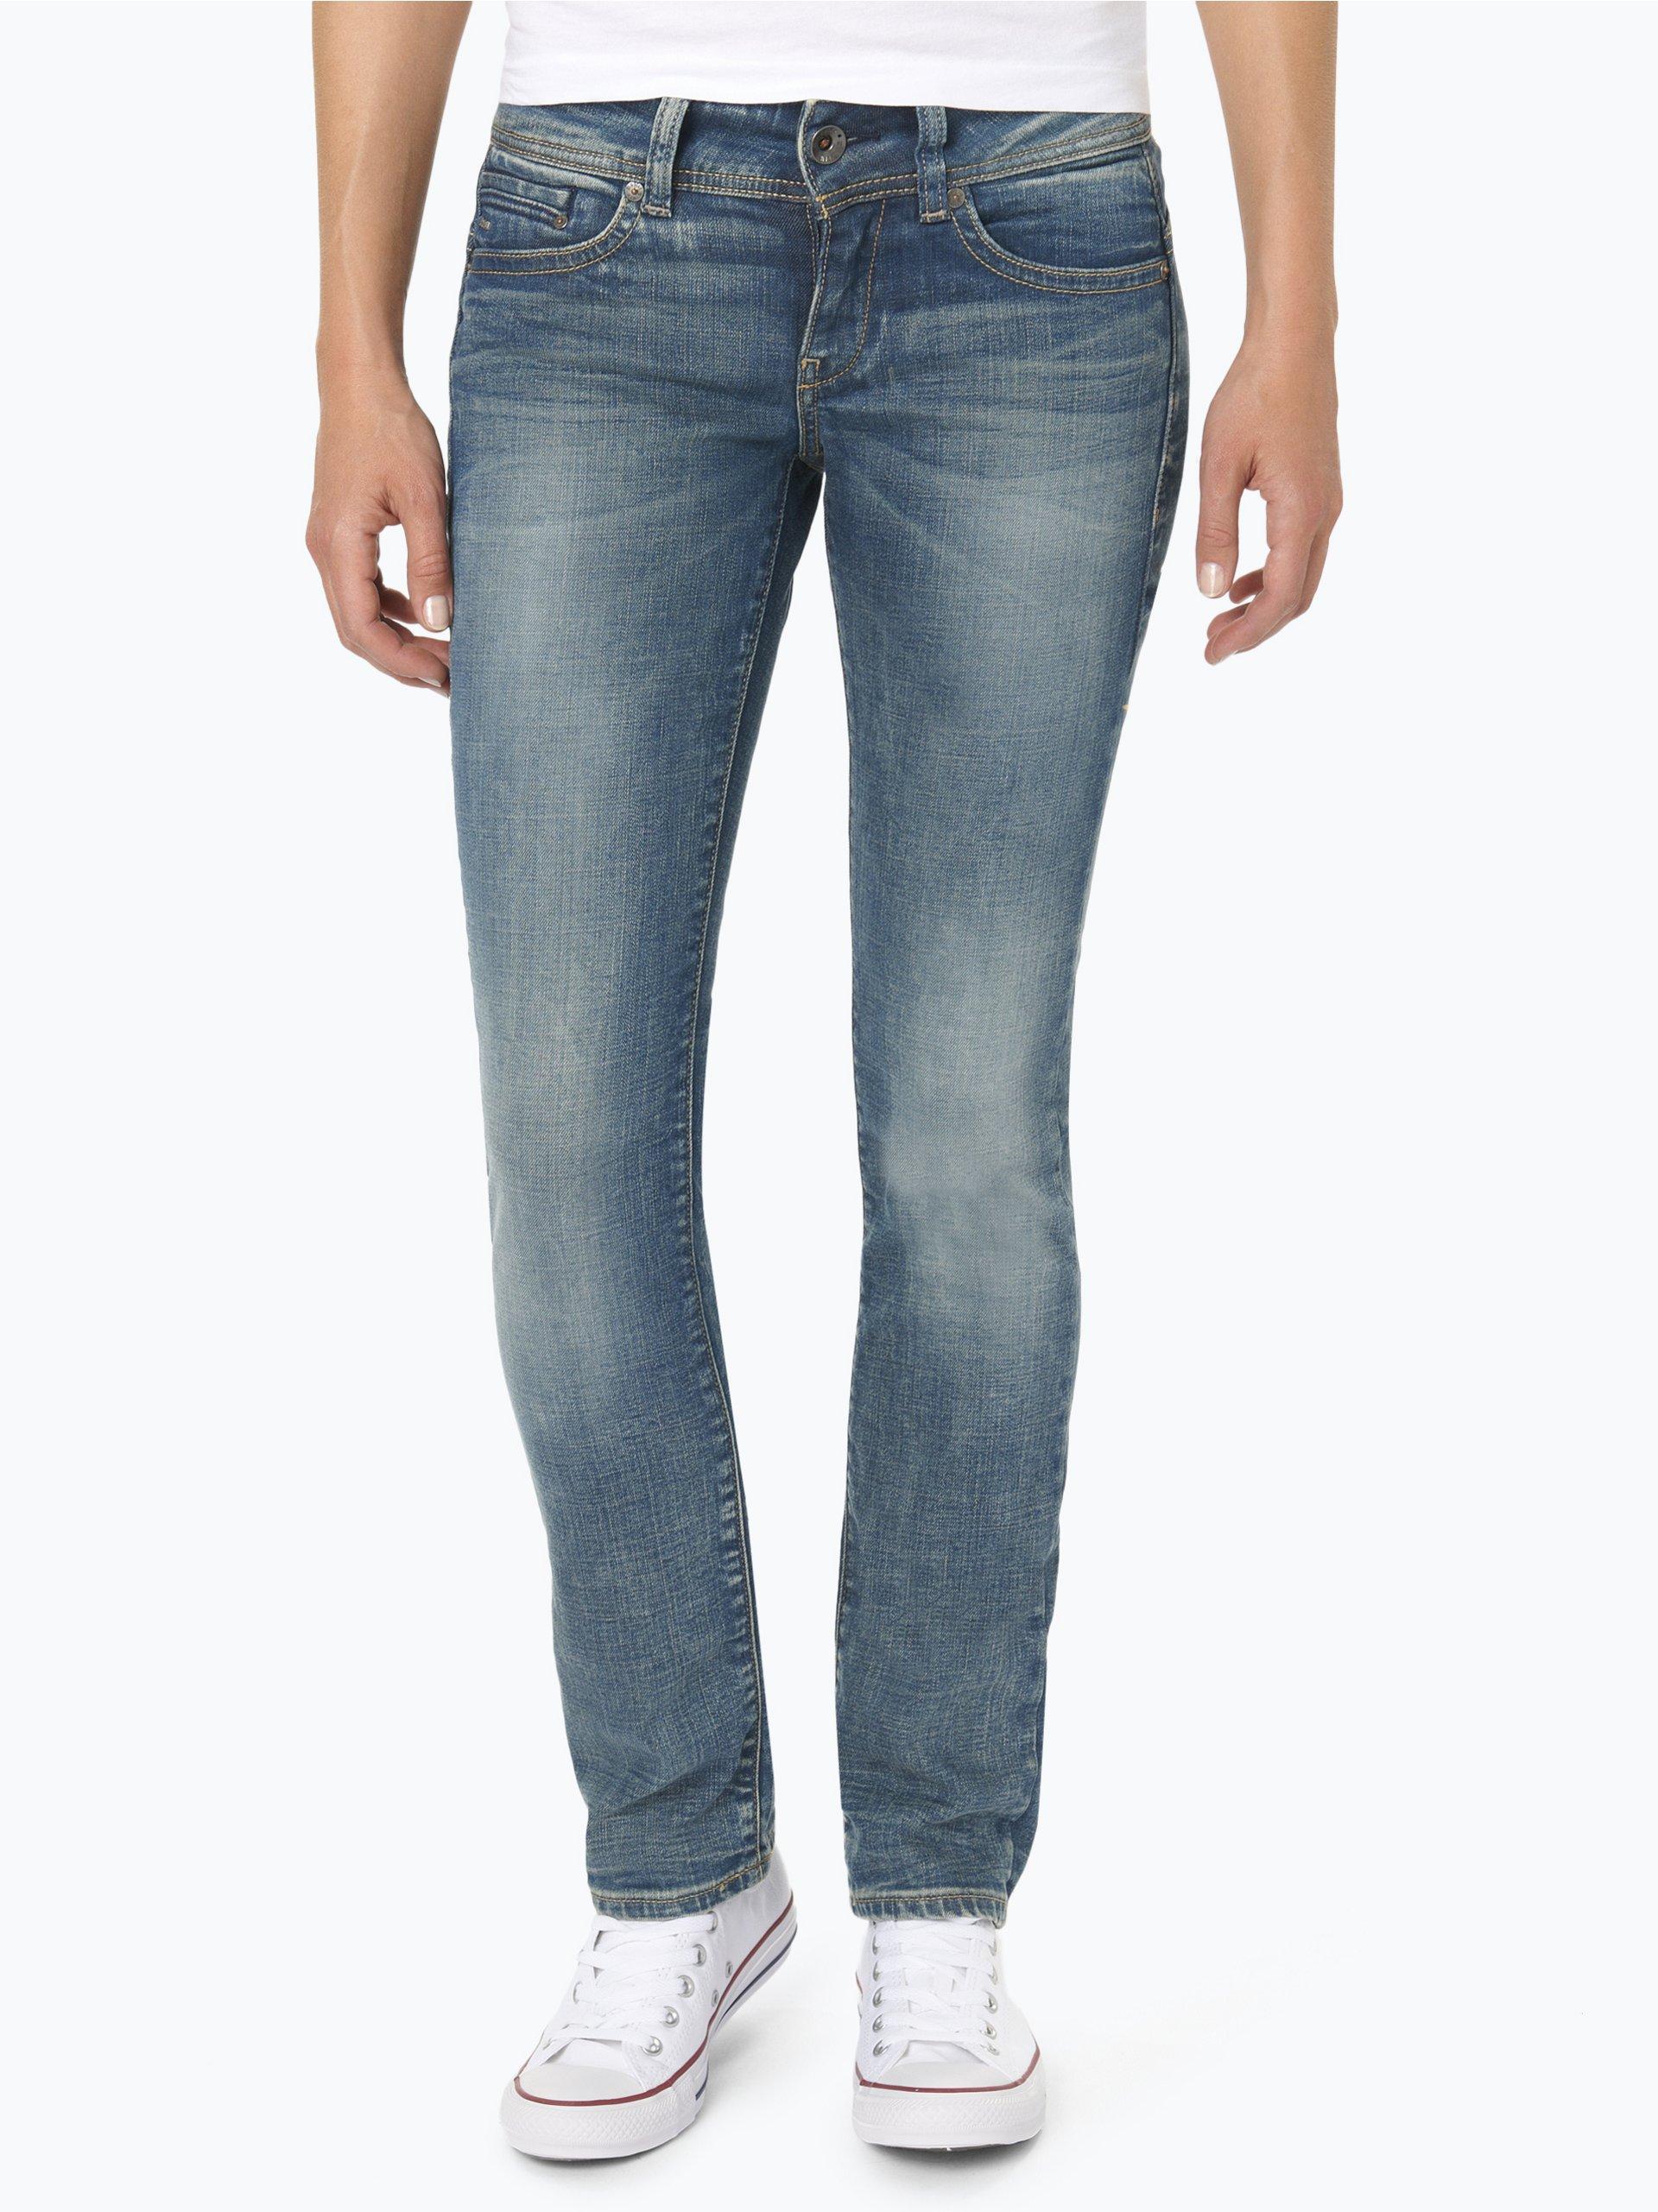 g star damen jeans midge blau uni online kaufen peek. Black Bedroom Furniture Sets. Home Design Ideas